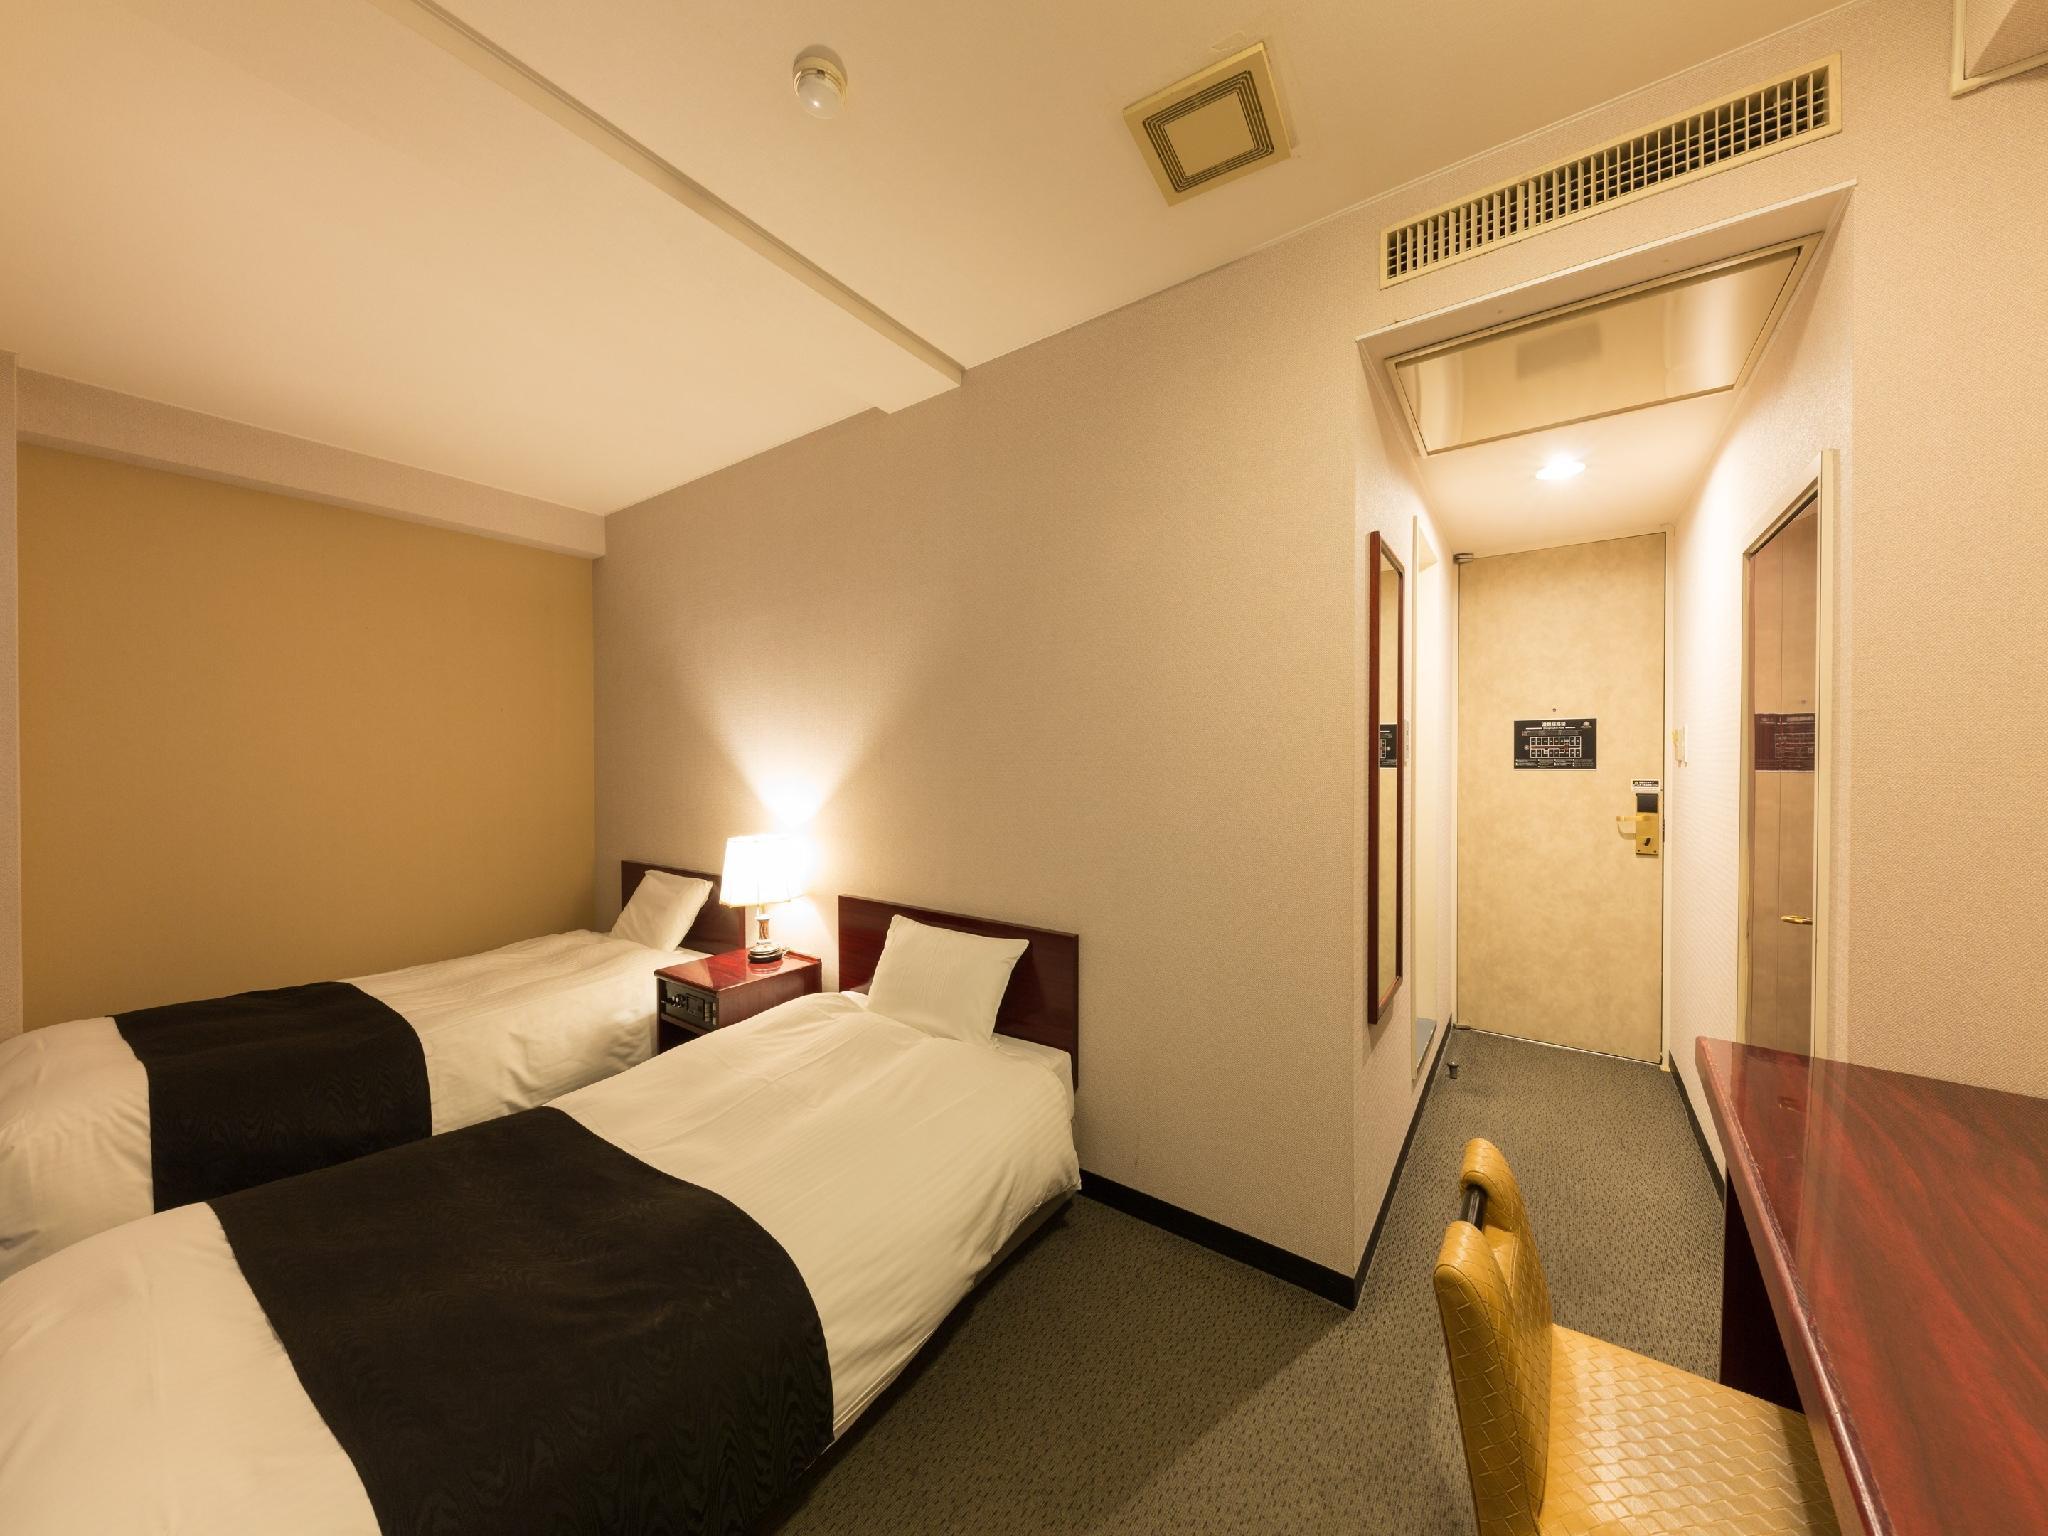 APA Hotel Tsubamesanjo-Ekimae, Tsubame